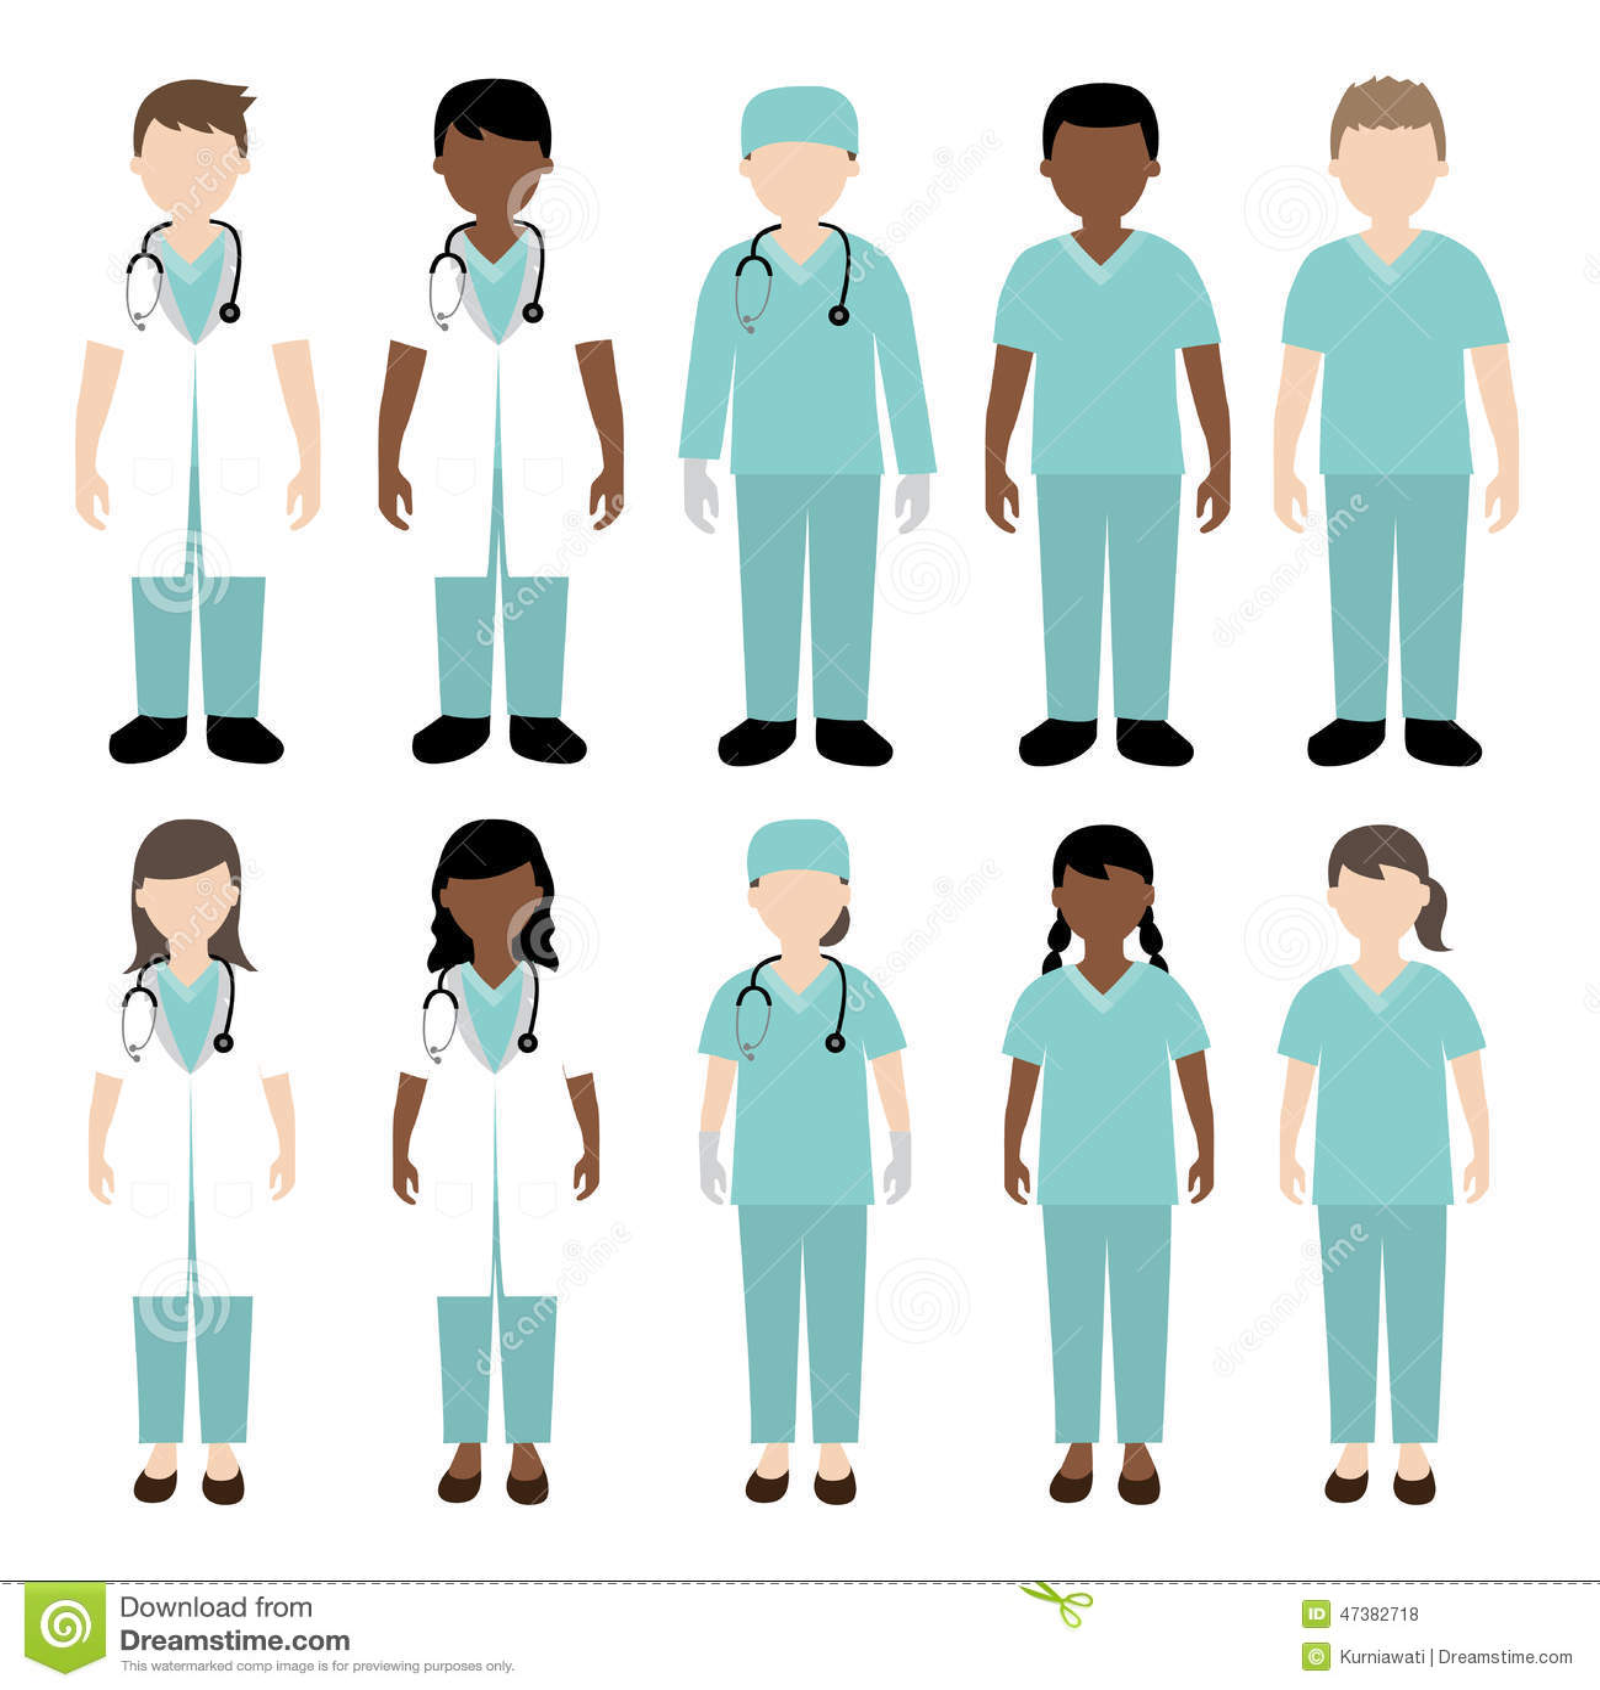 Male Nurse Clipart: Nurse Doctor Scrubs Acrylic Blank